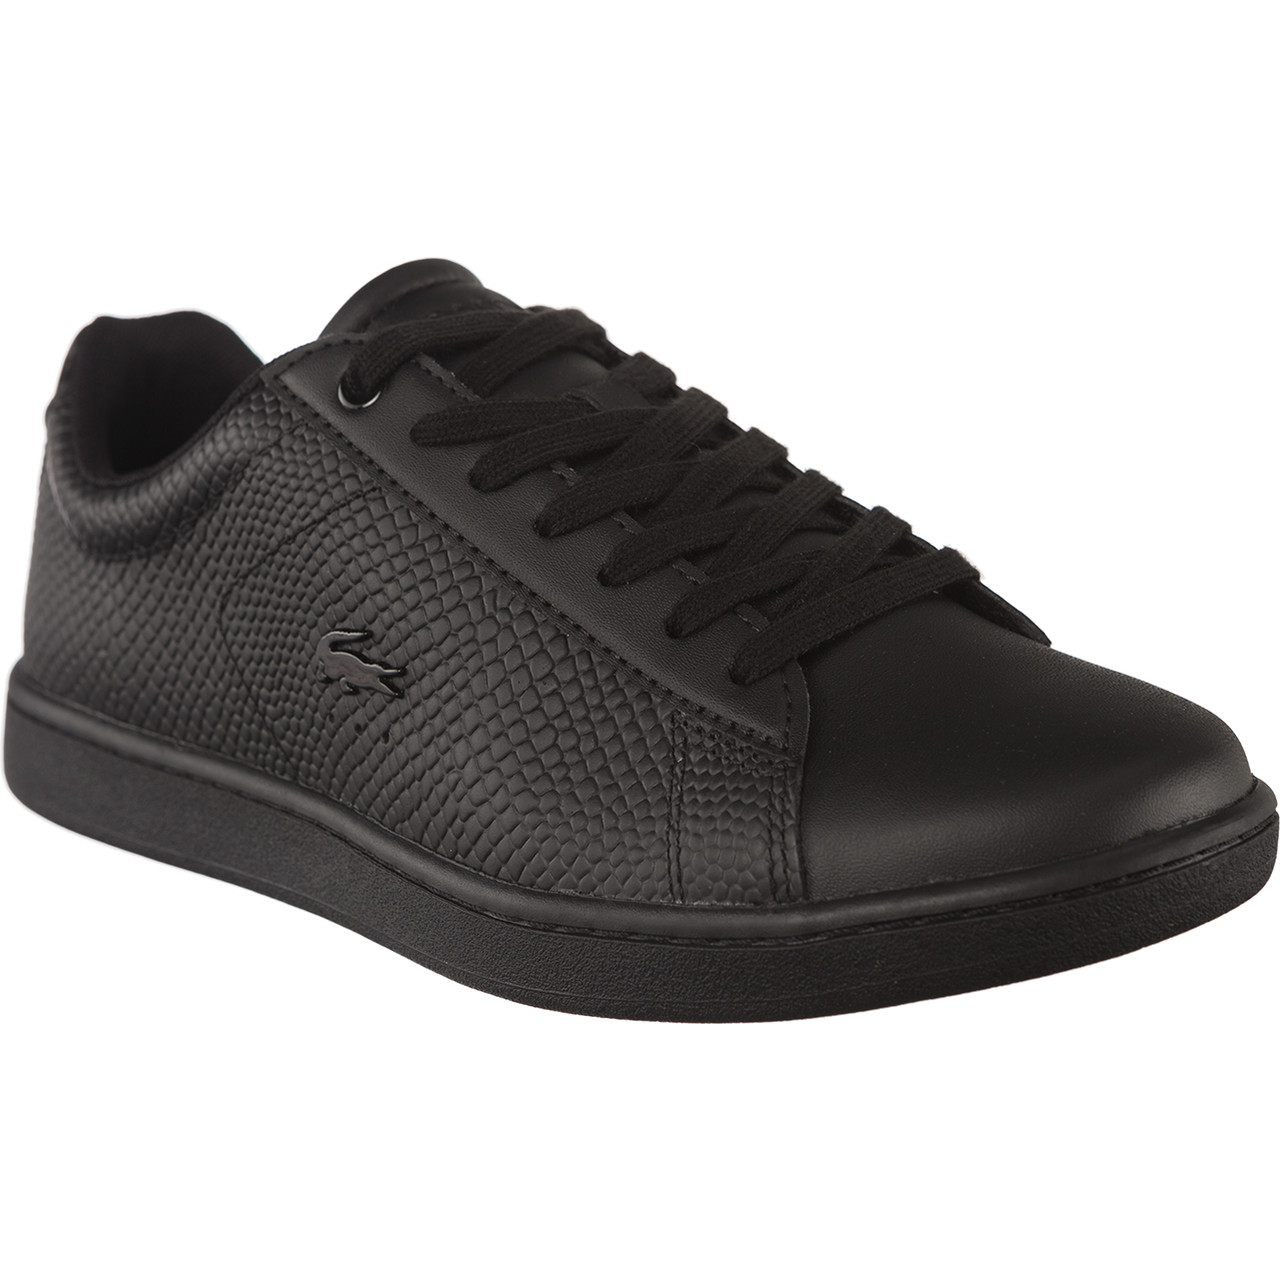 New Balance Shoes Distributors